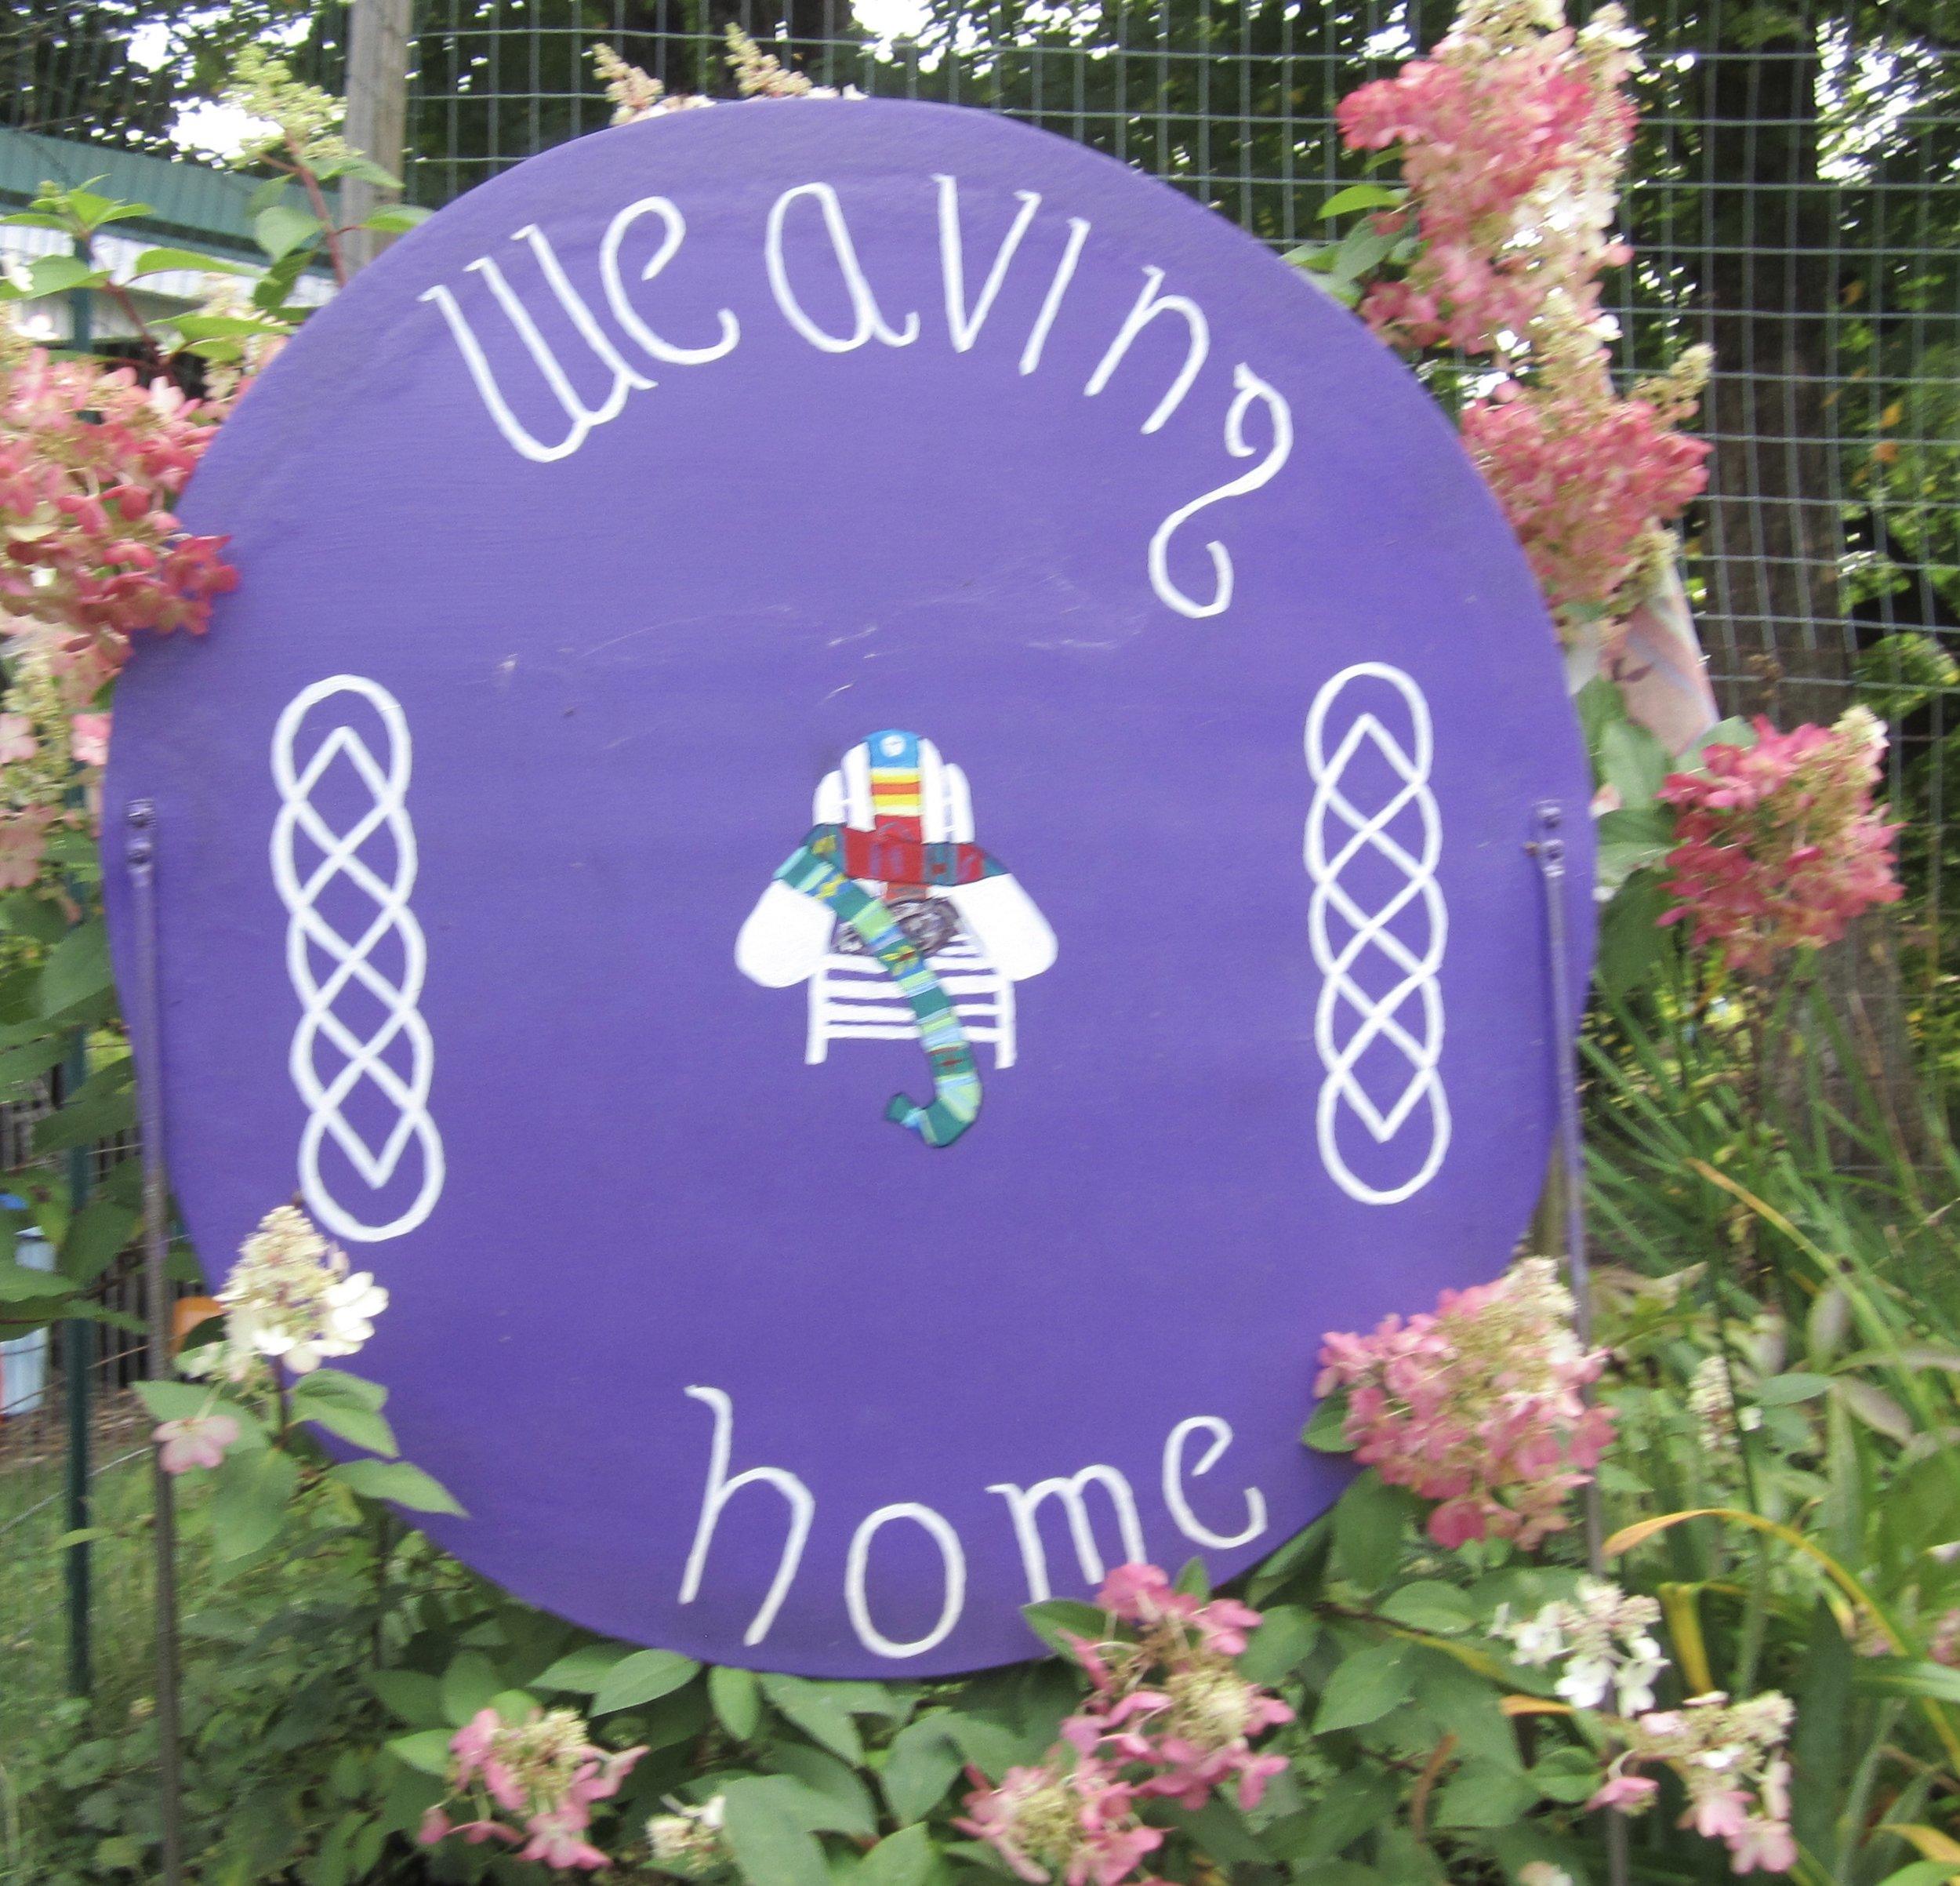 Weaving Home: Nurturing spiritual awareness through contemplative, creative and compassionate living.